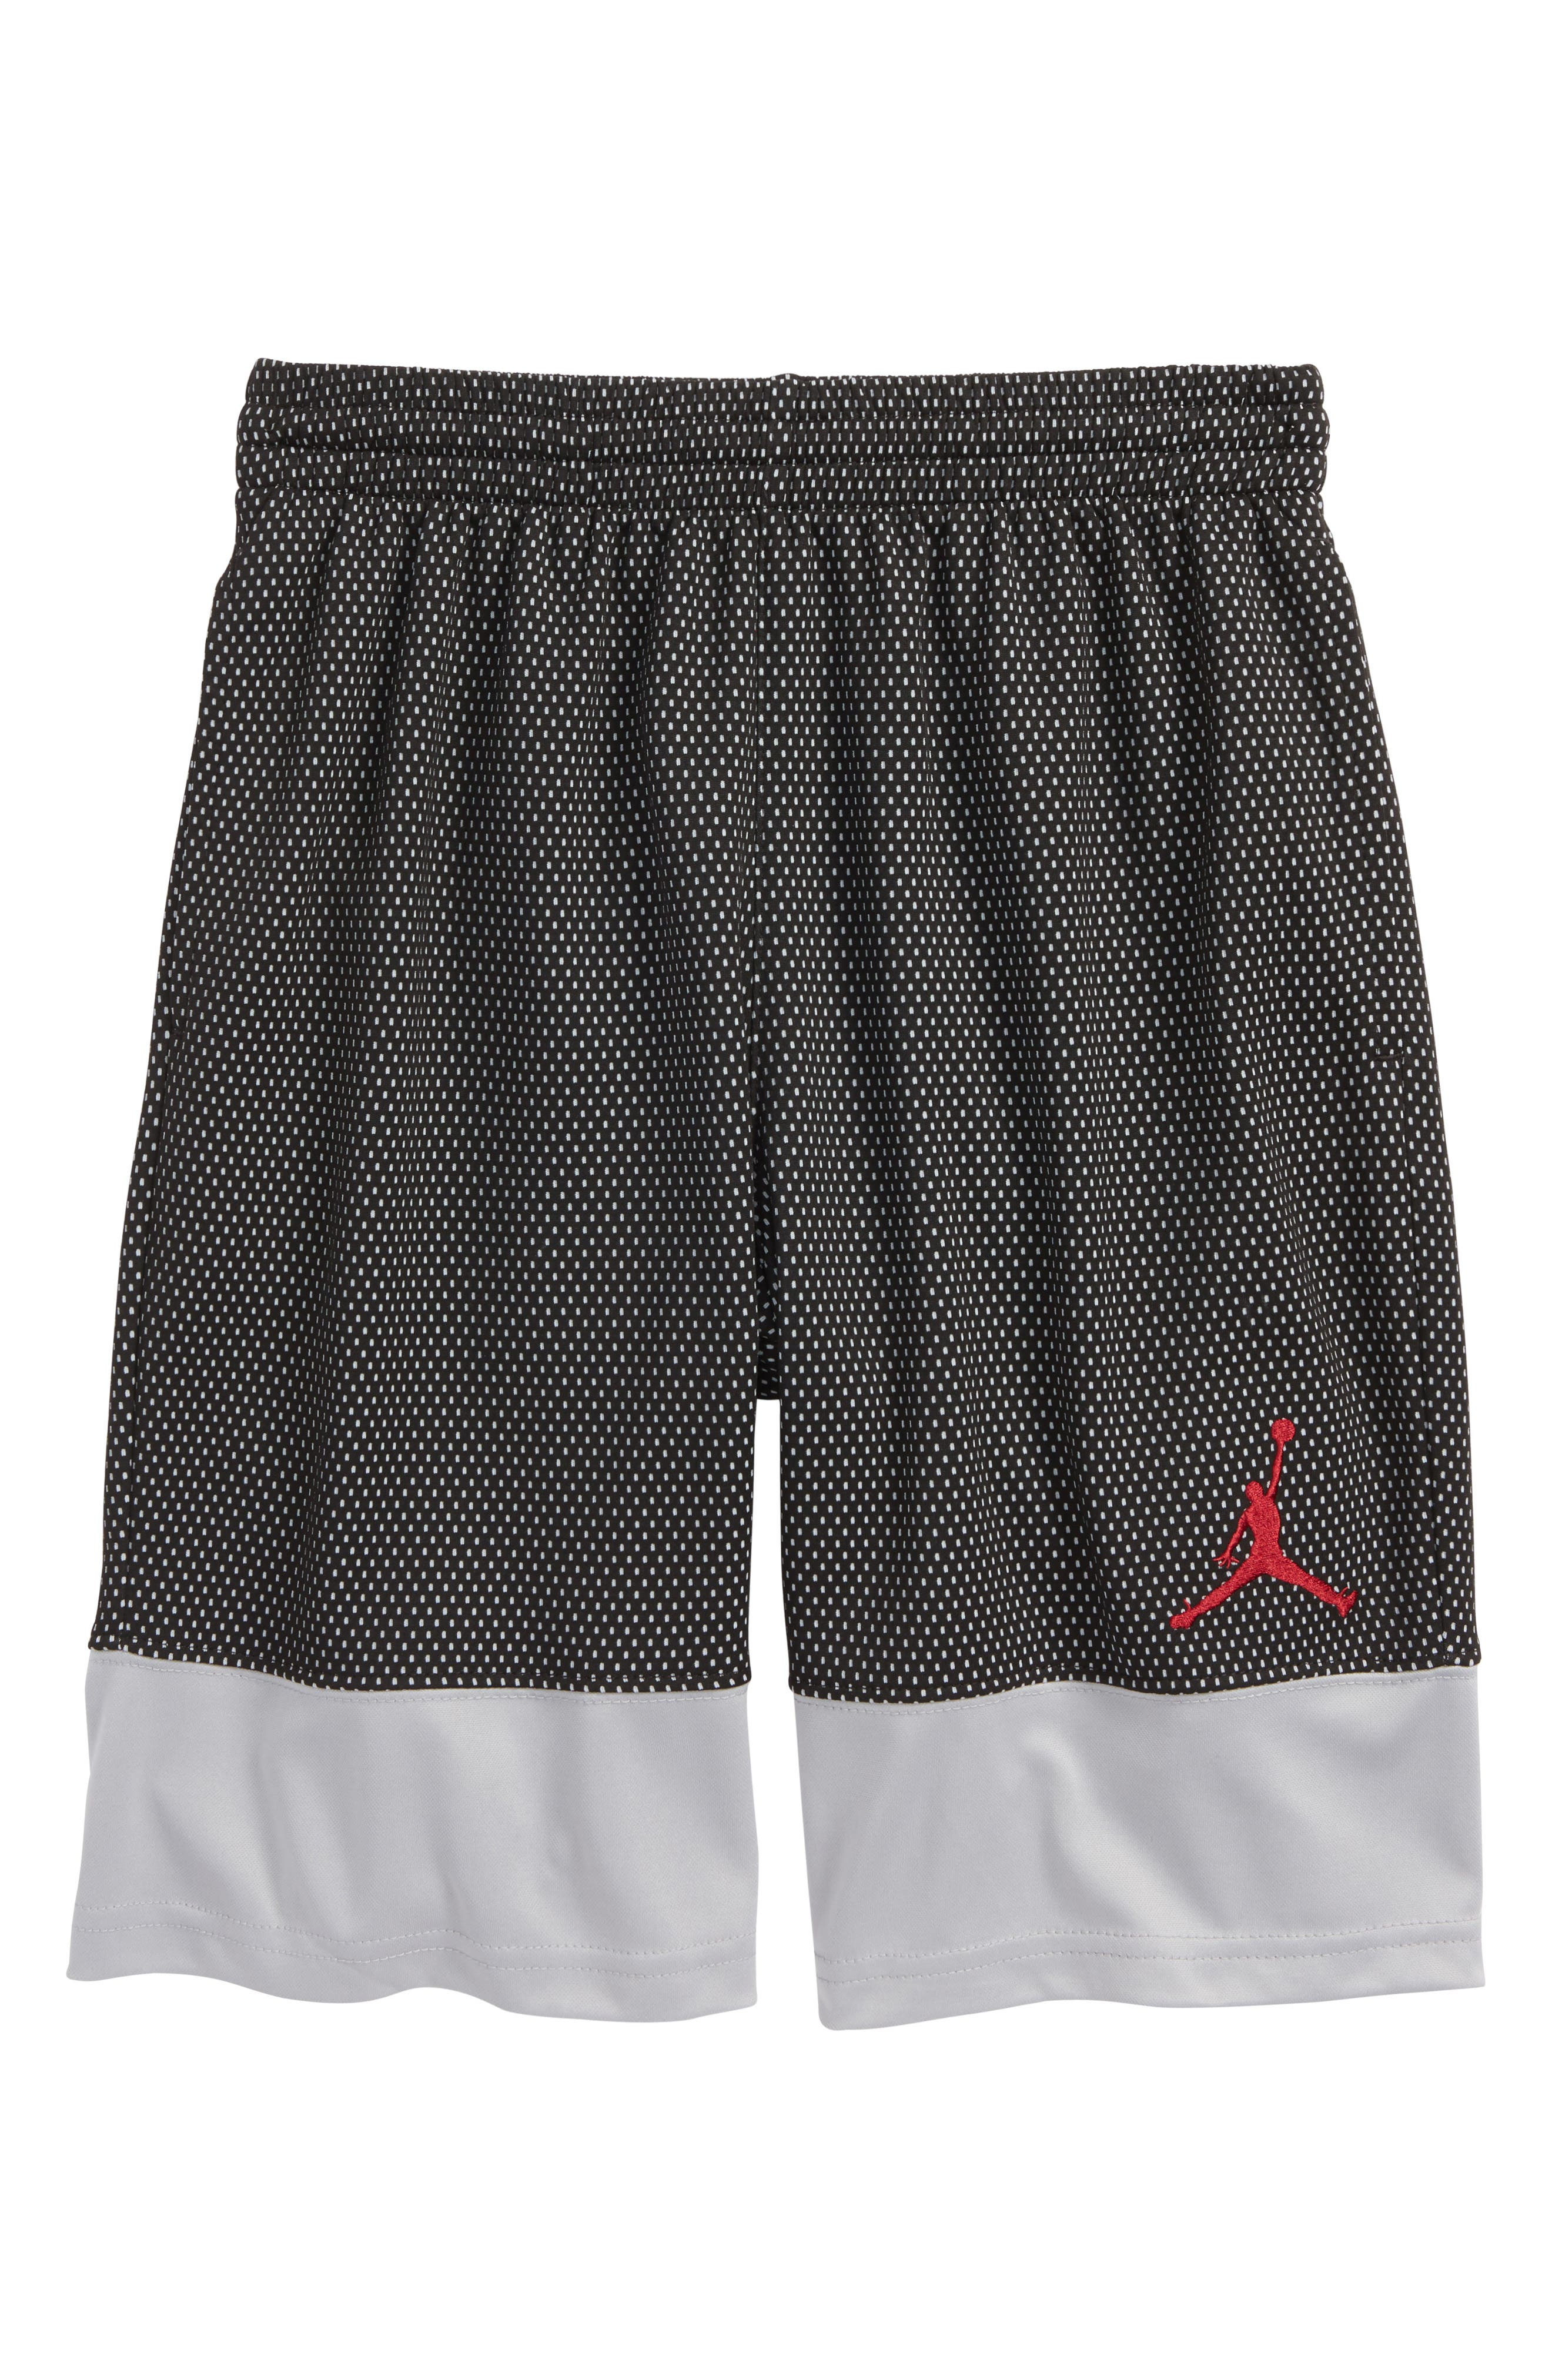 Jordan AJ 90s D2 Mesh Shorts,                         Main,                         color, Black